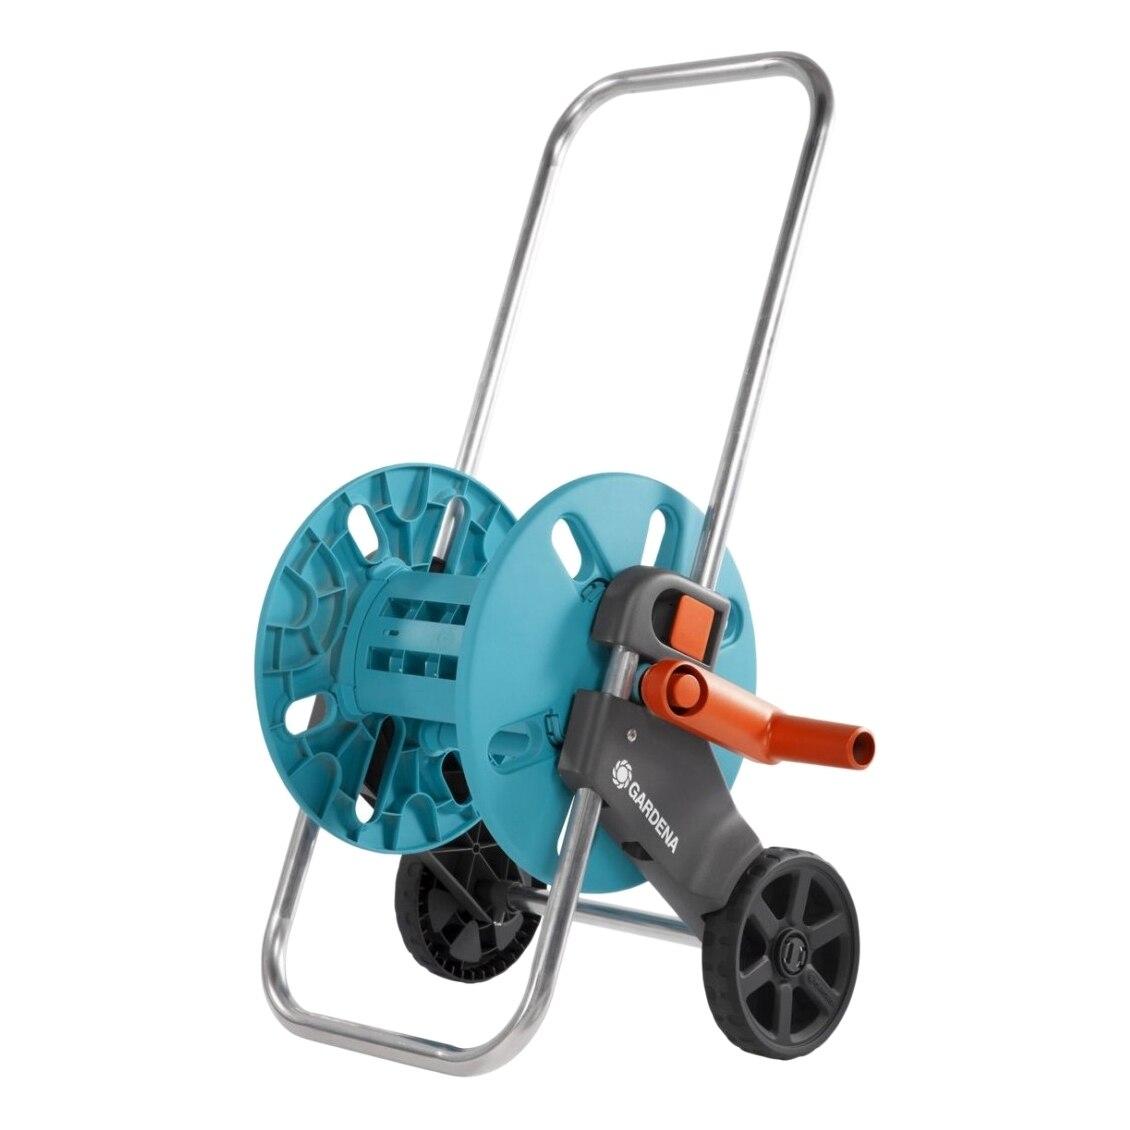 Set поливочный GARDENA 18502-50.000.00 (Hose 20 m, tip for watering) hose watering gardena 18099 2000000